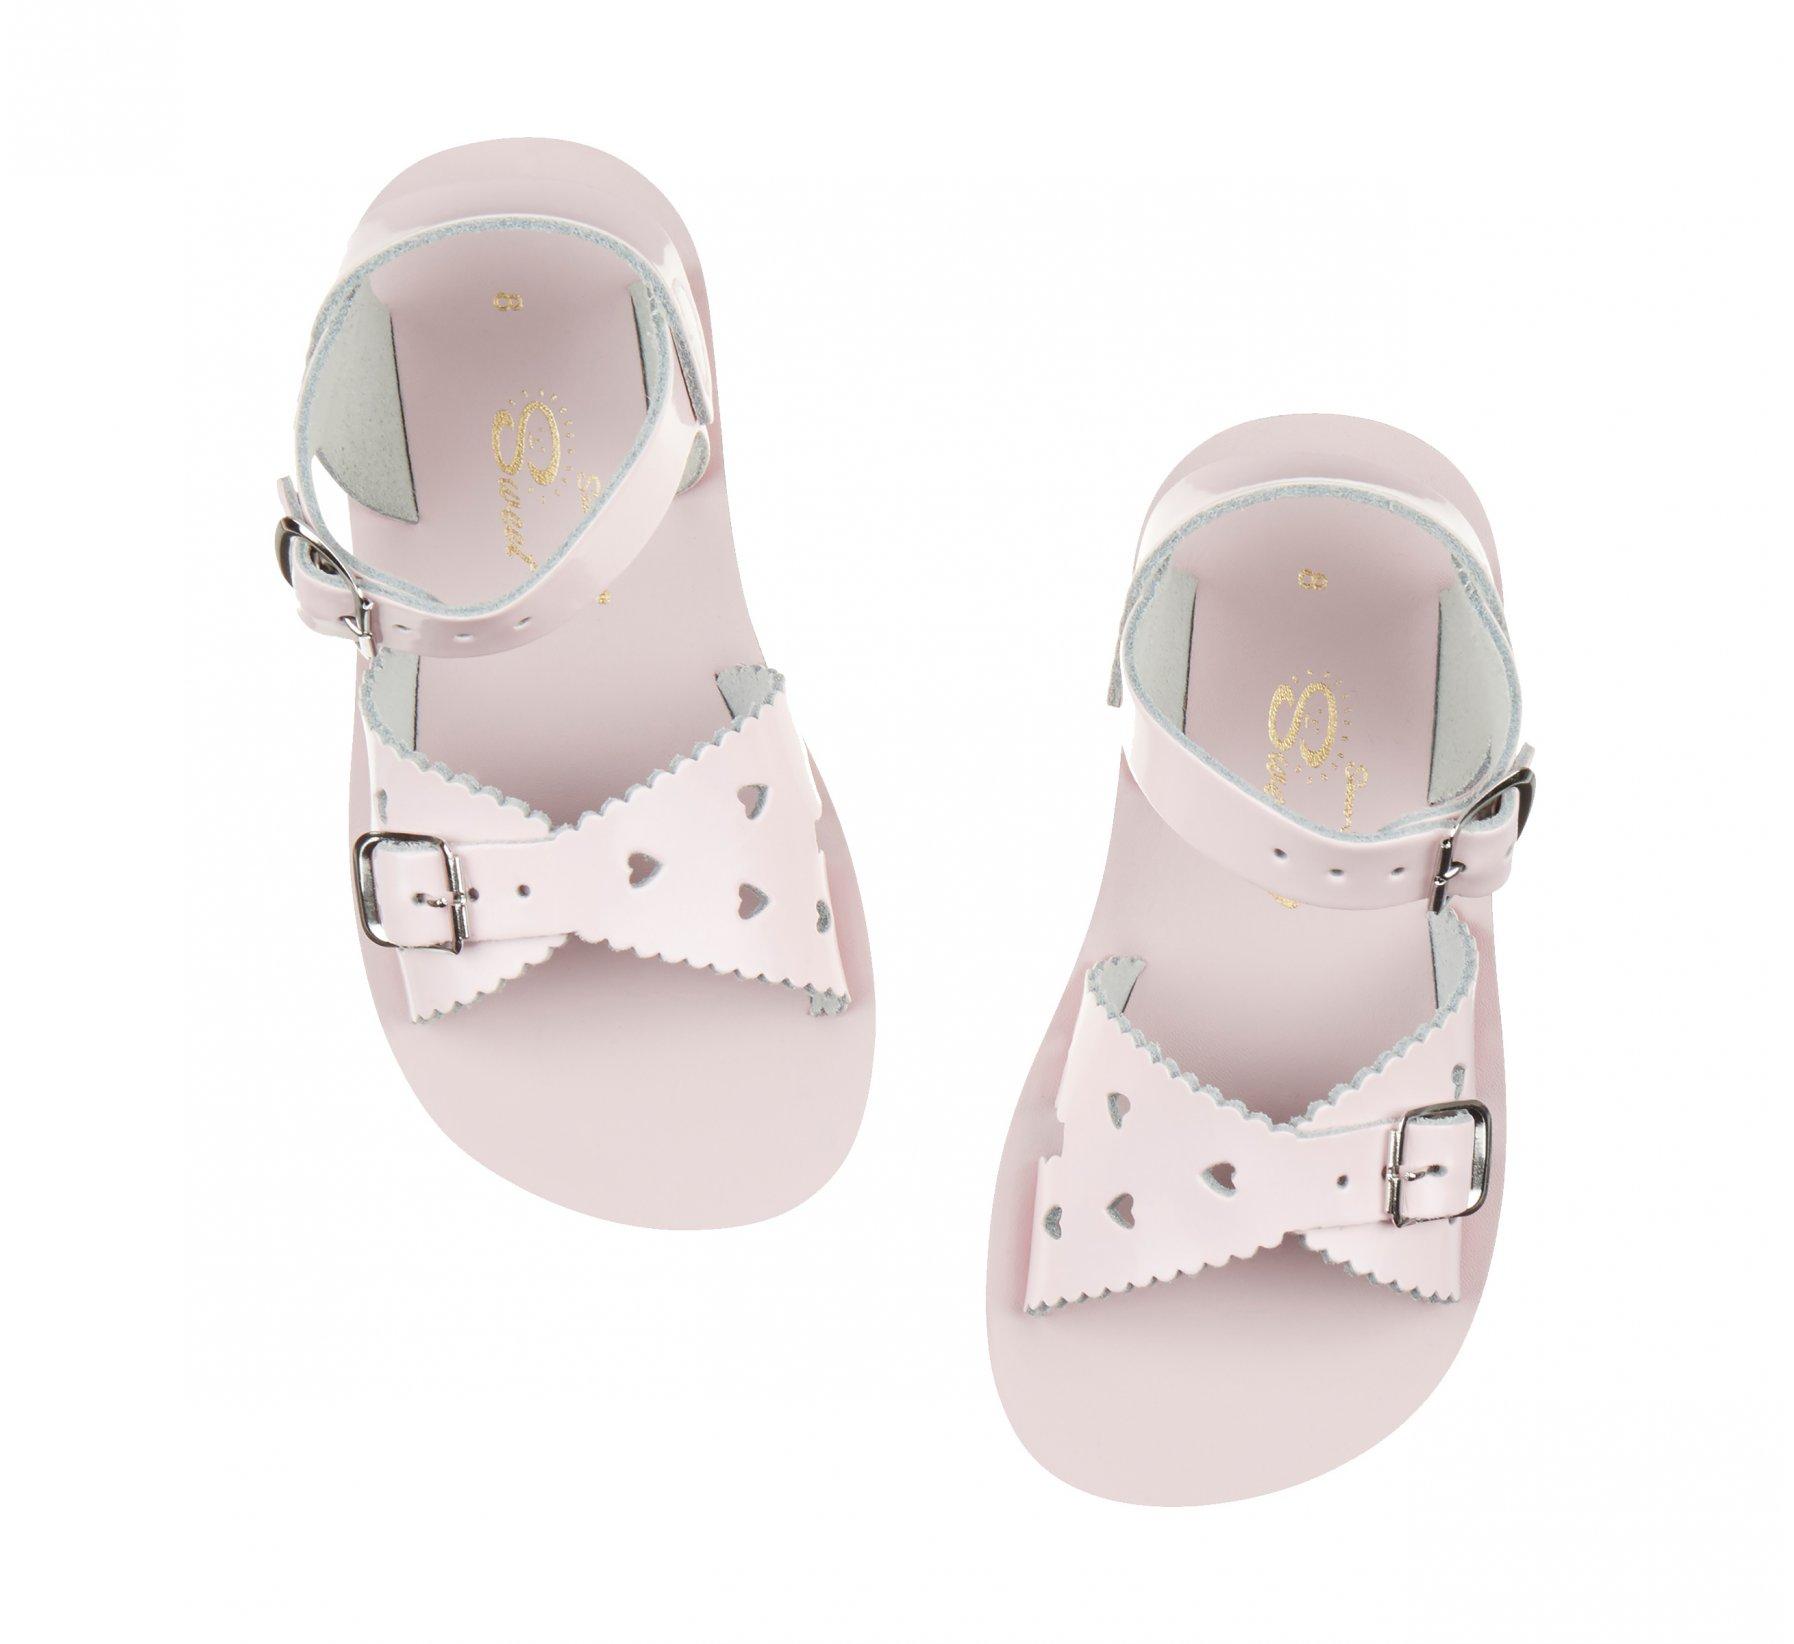 Sweetheart Shiny Pink  - Salt Water Sandals